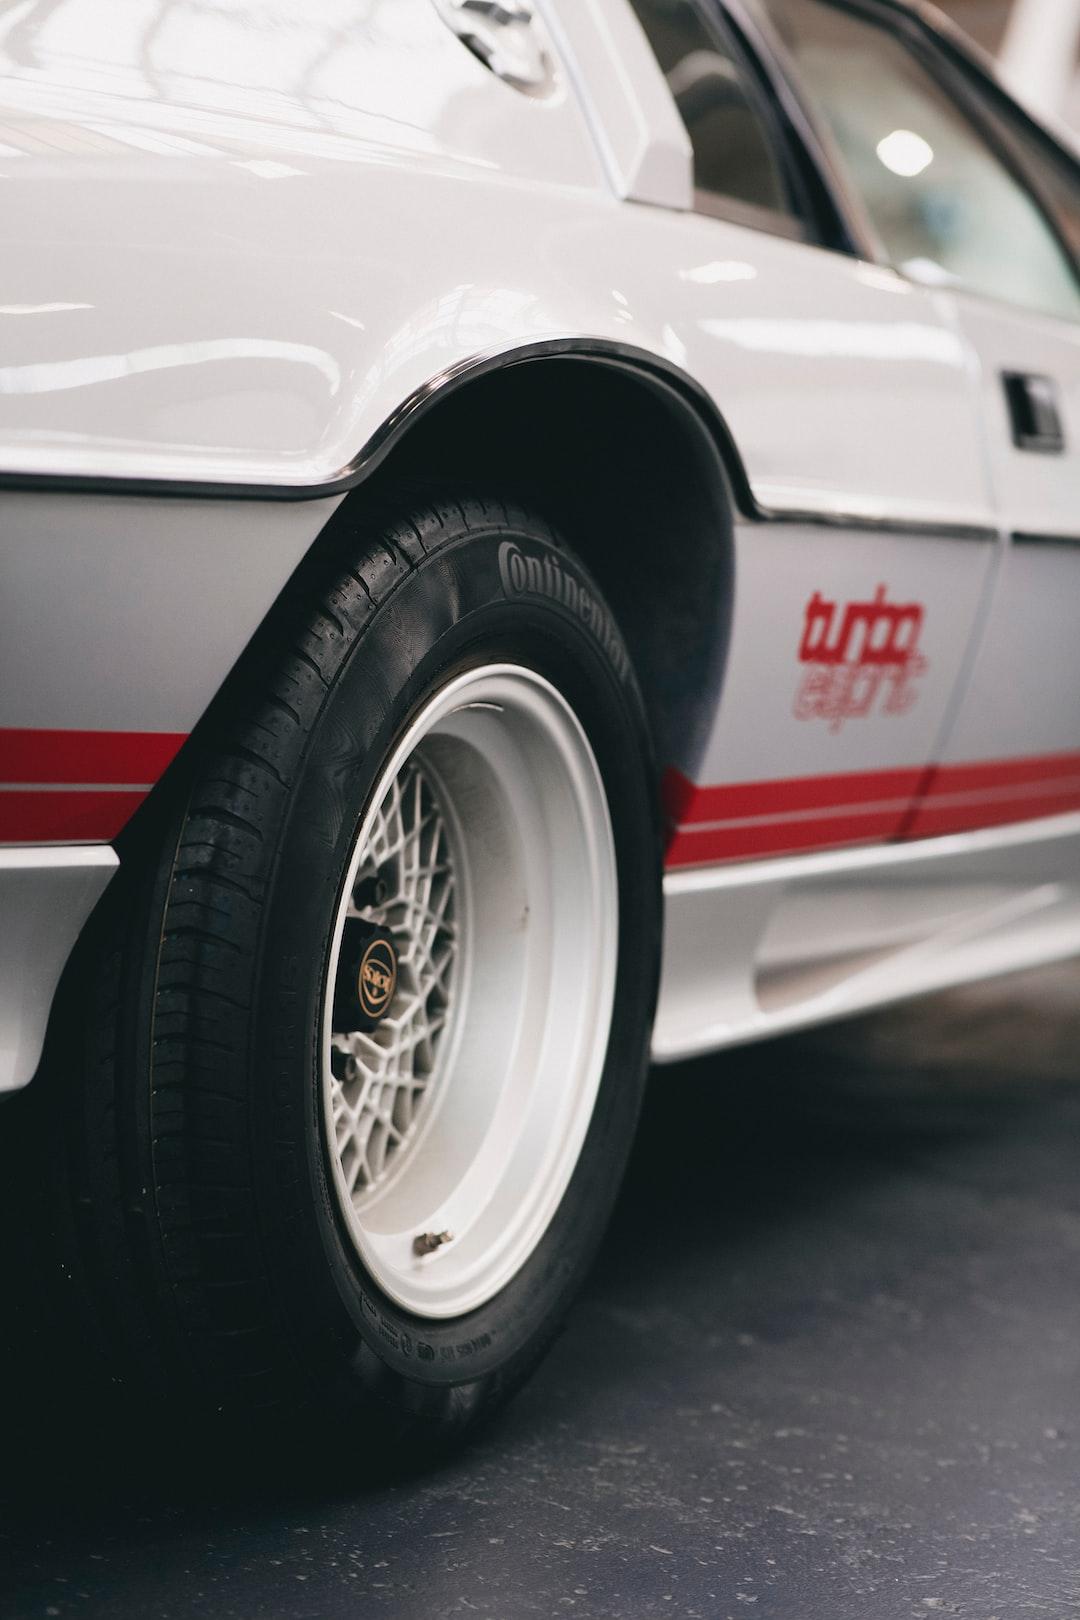 Vintage british classic oldtimer sports car – Lotus Esprit Turbo S3 2.2